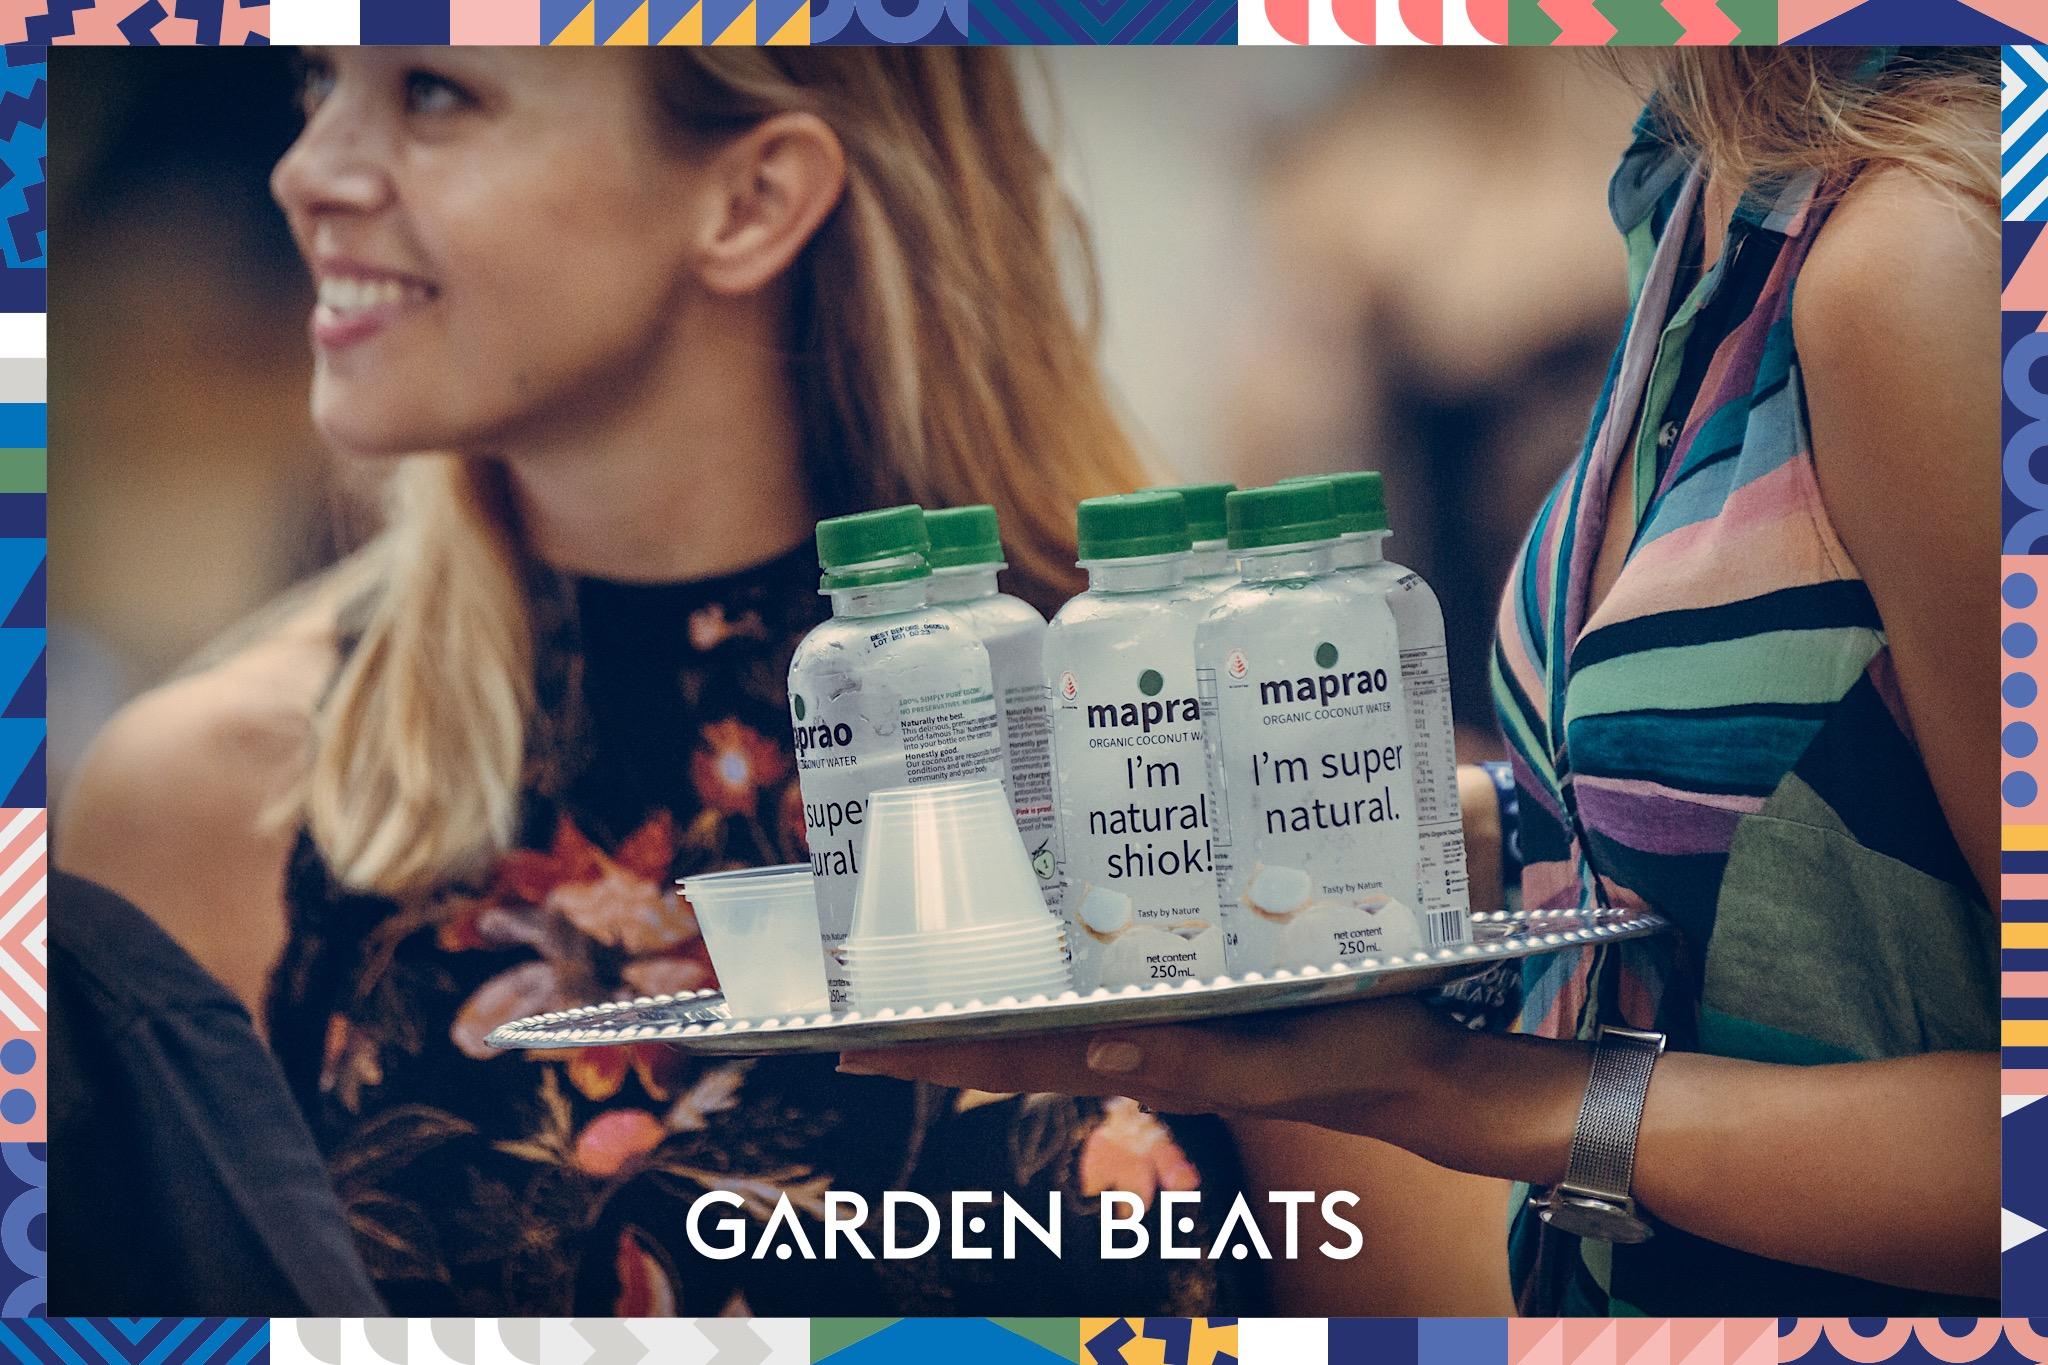 03032018_GardenBeats_Colossal471_Watermarked.jpg